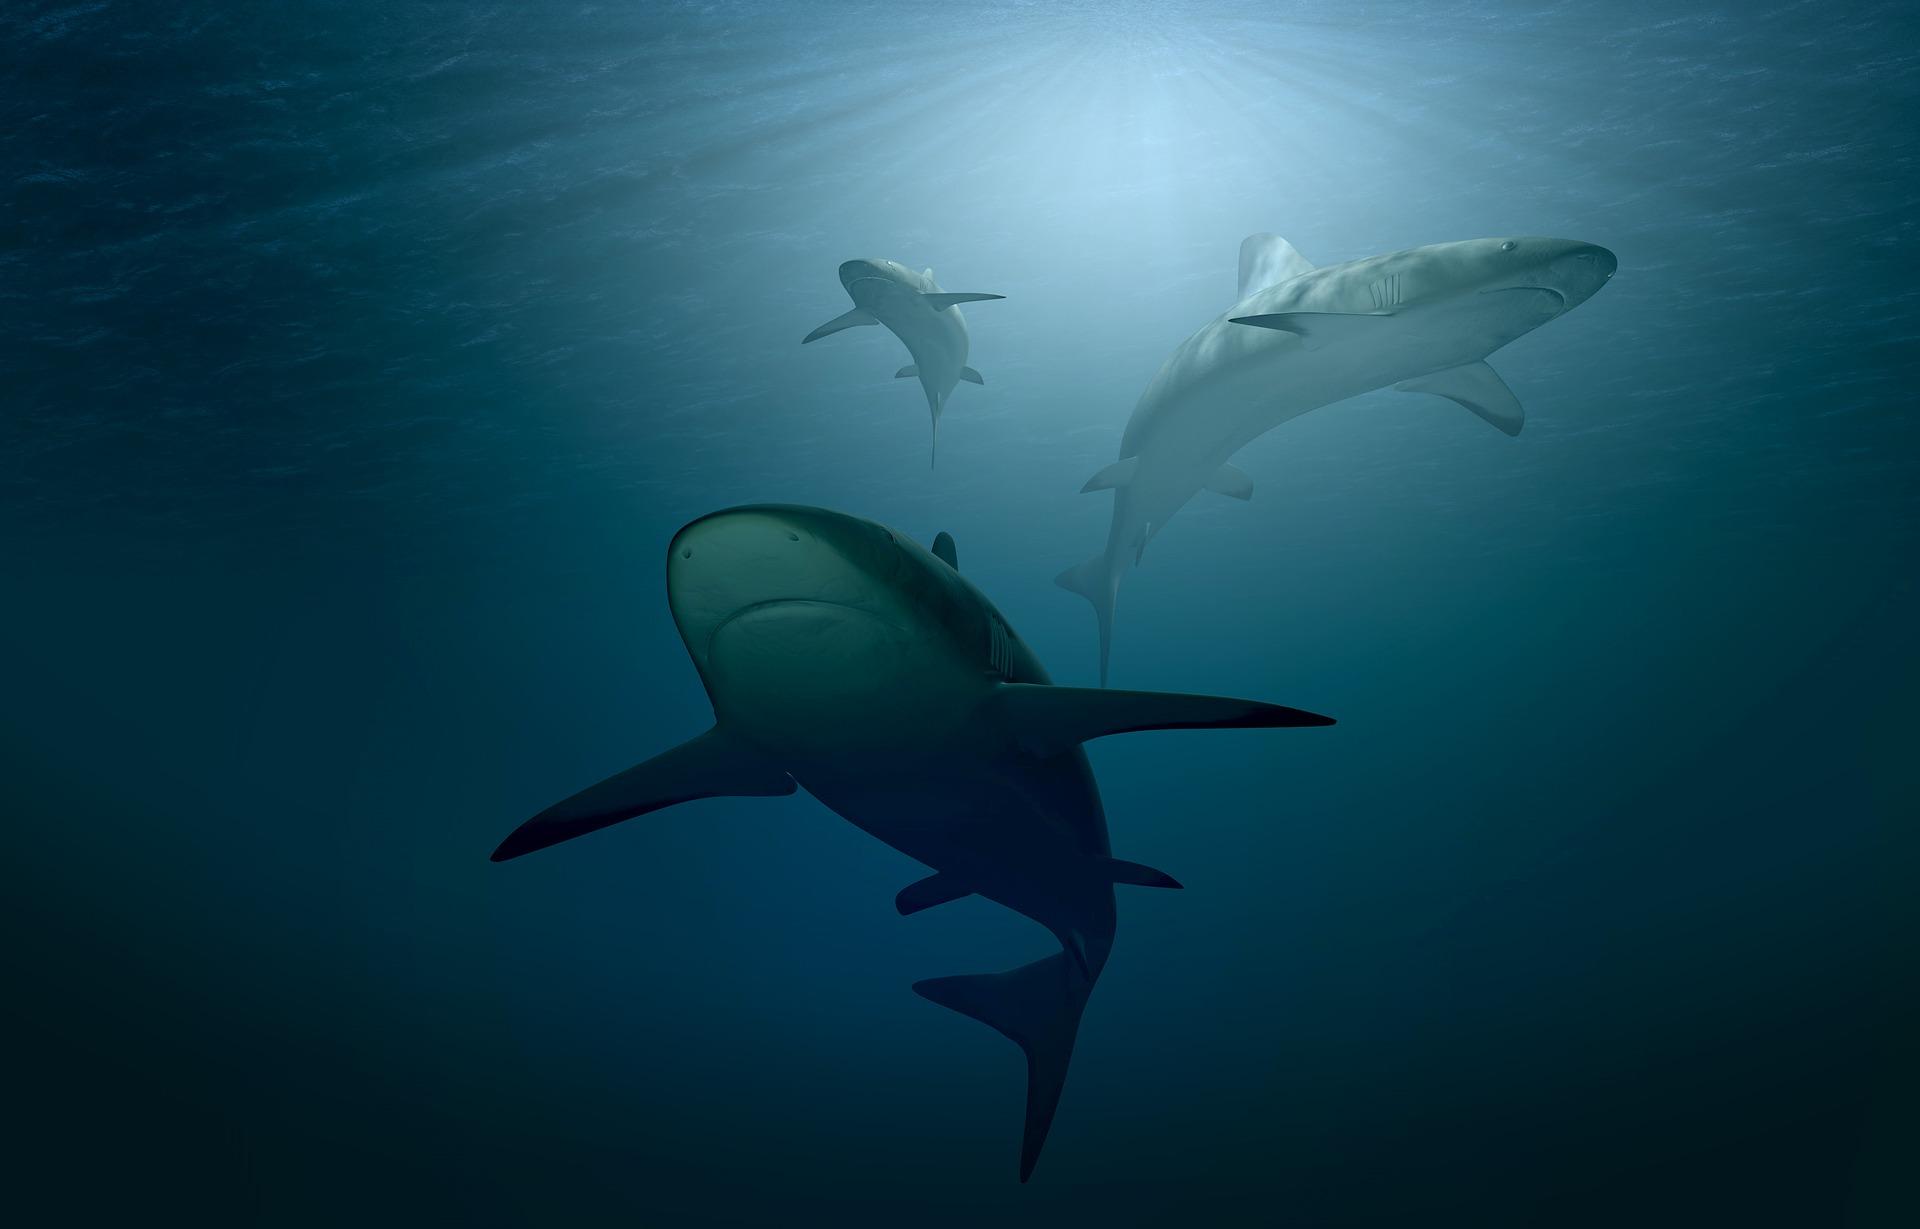 L'huile de foie de requin contient de l'alkylglycerol, un nutriment anti-tumoral.